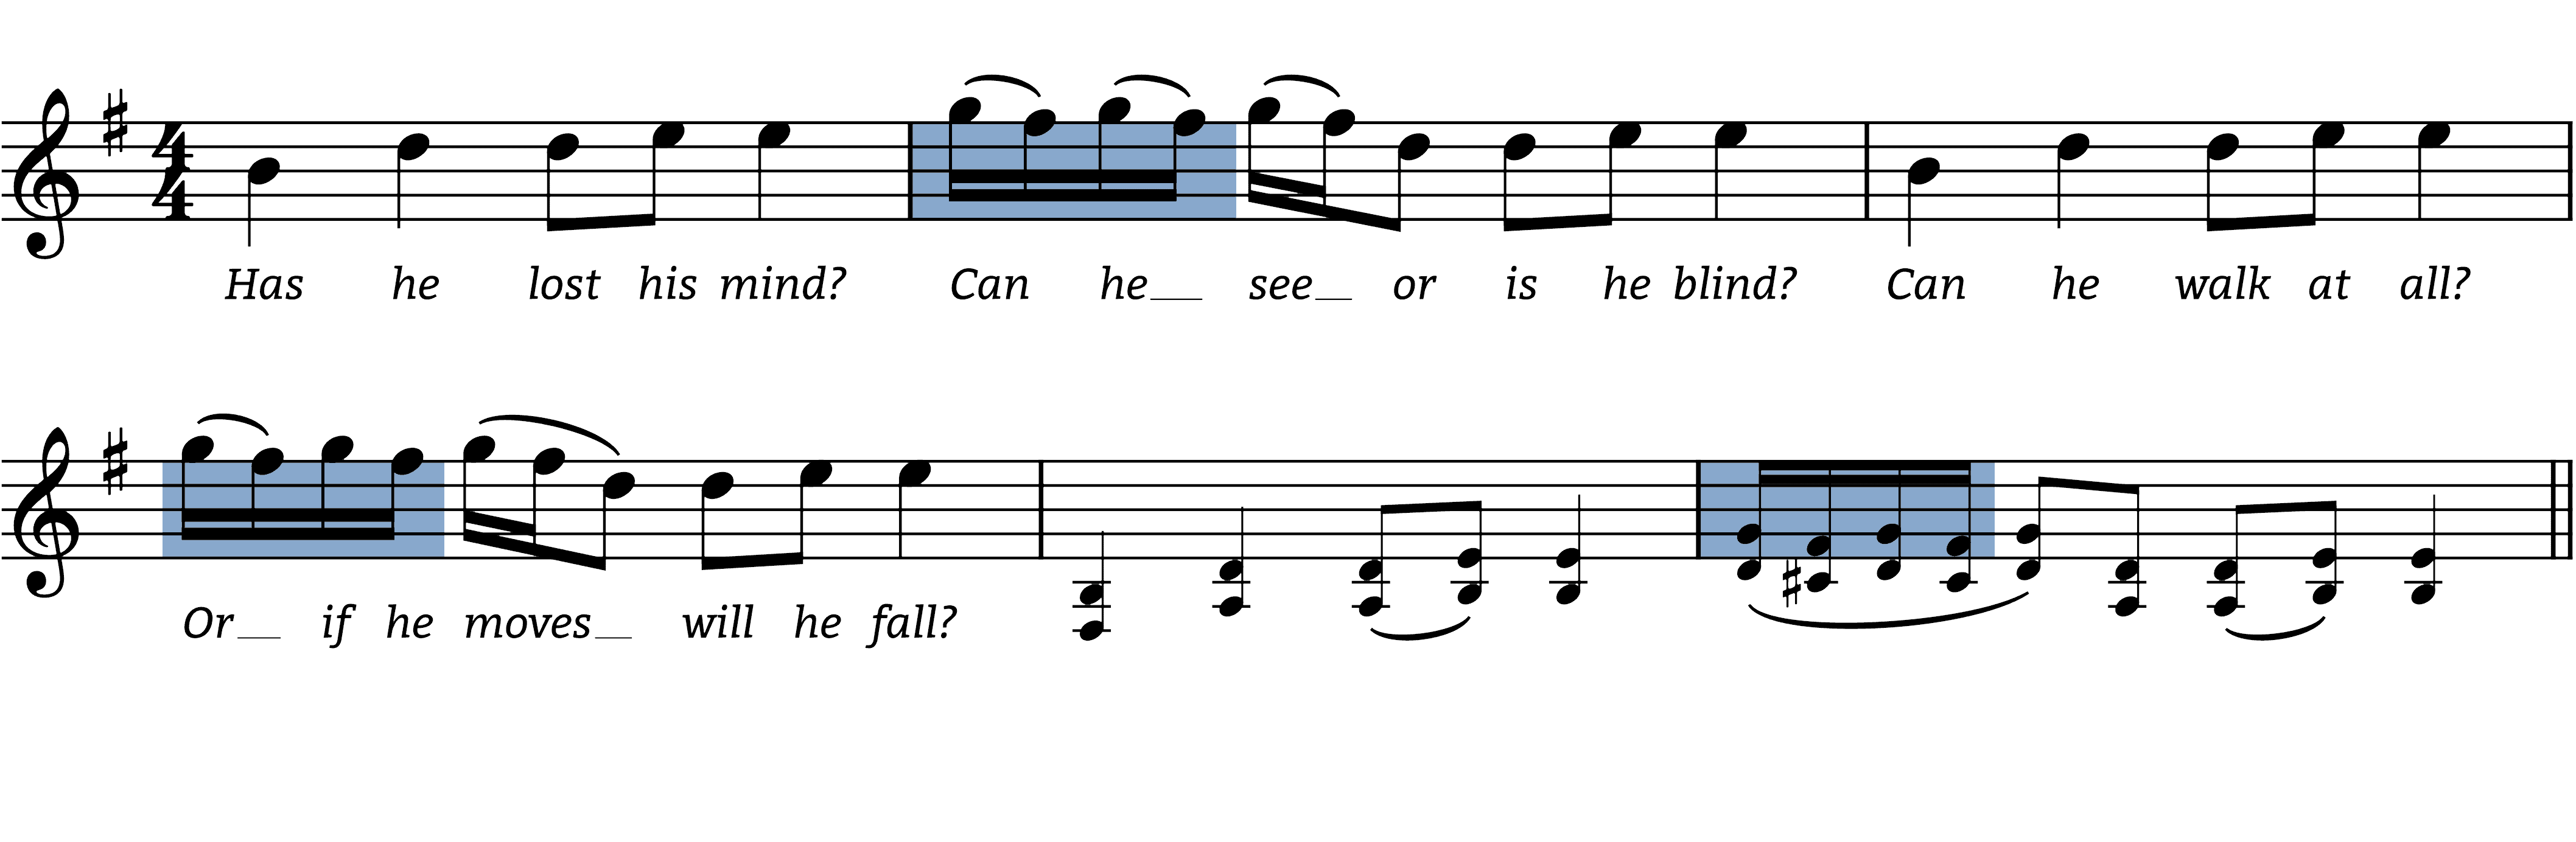 iron-man melodic figures